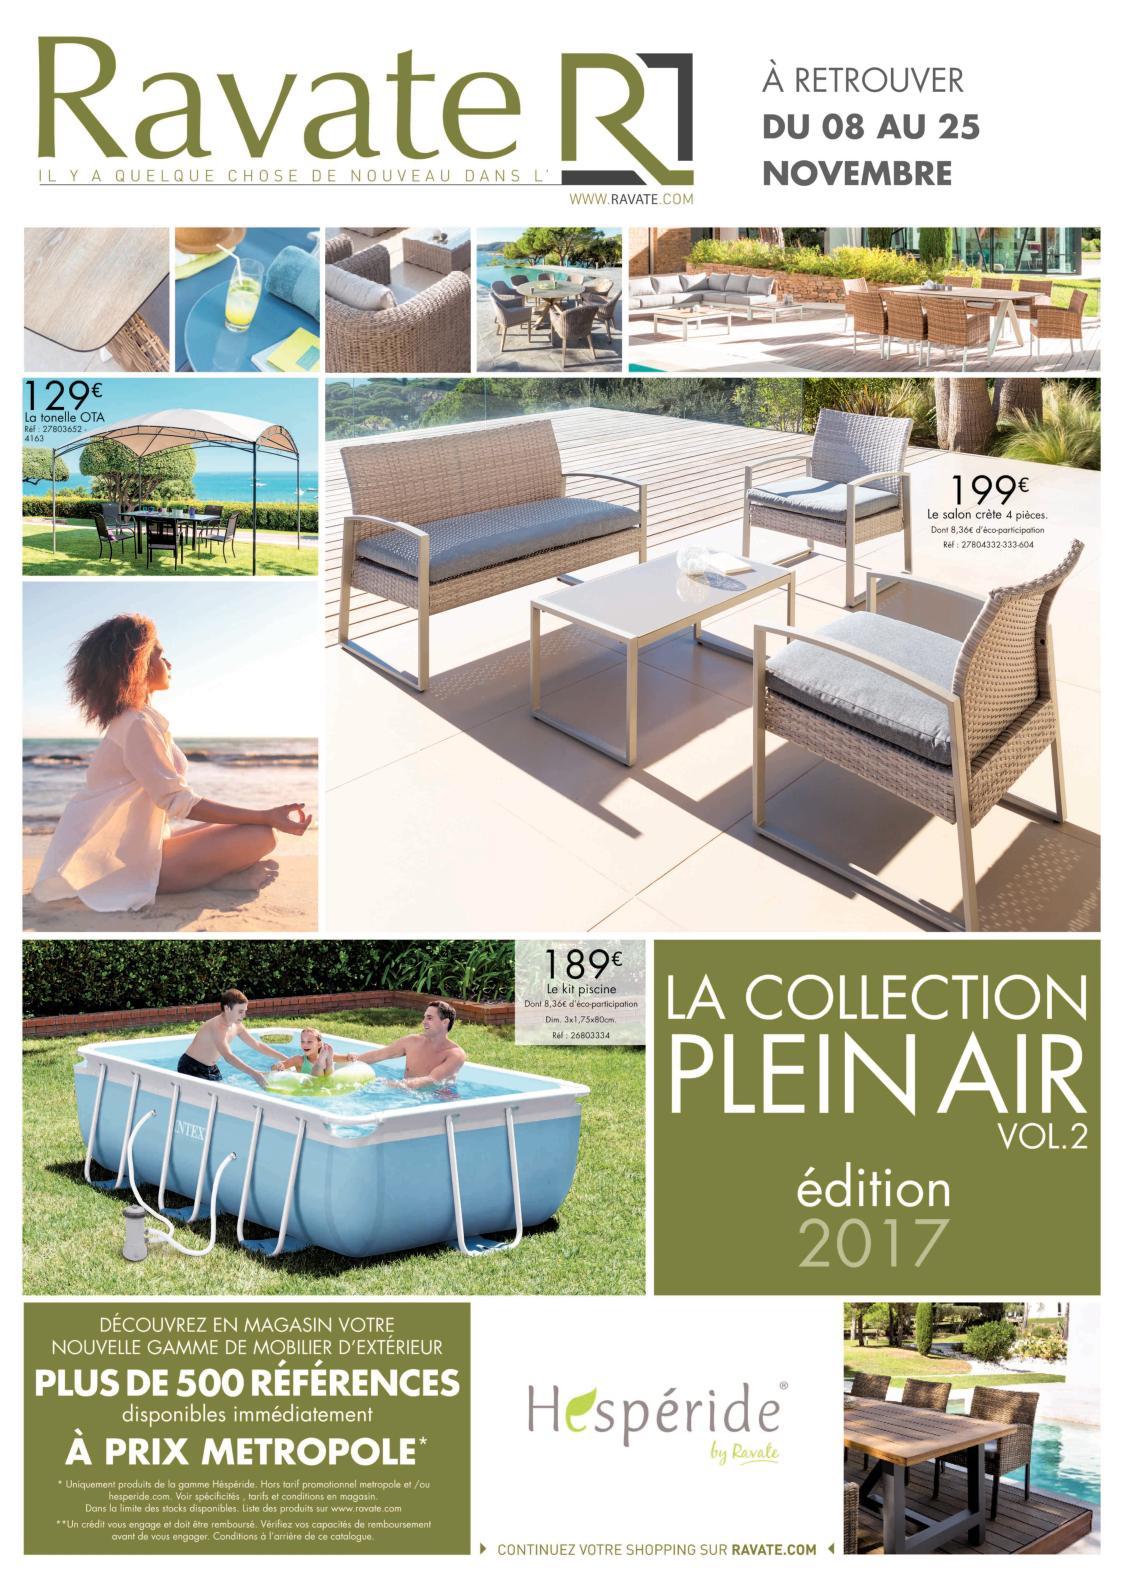 Calaméo - Catalogue Jardin Vol 2! encequiconcerne Tonelle De Jardin